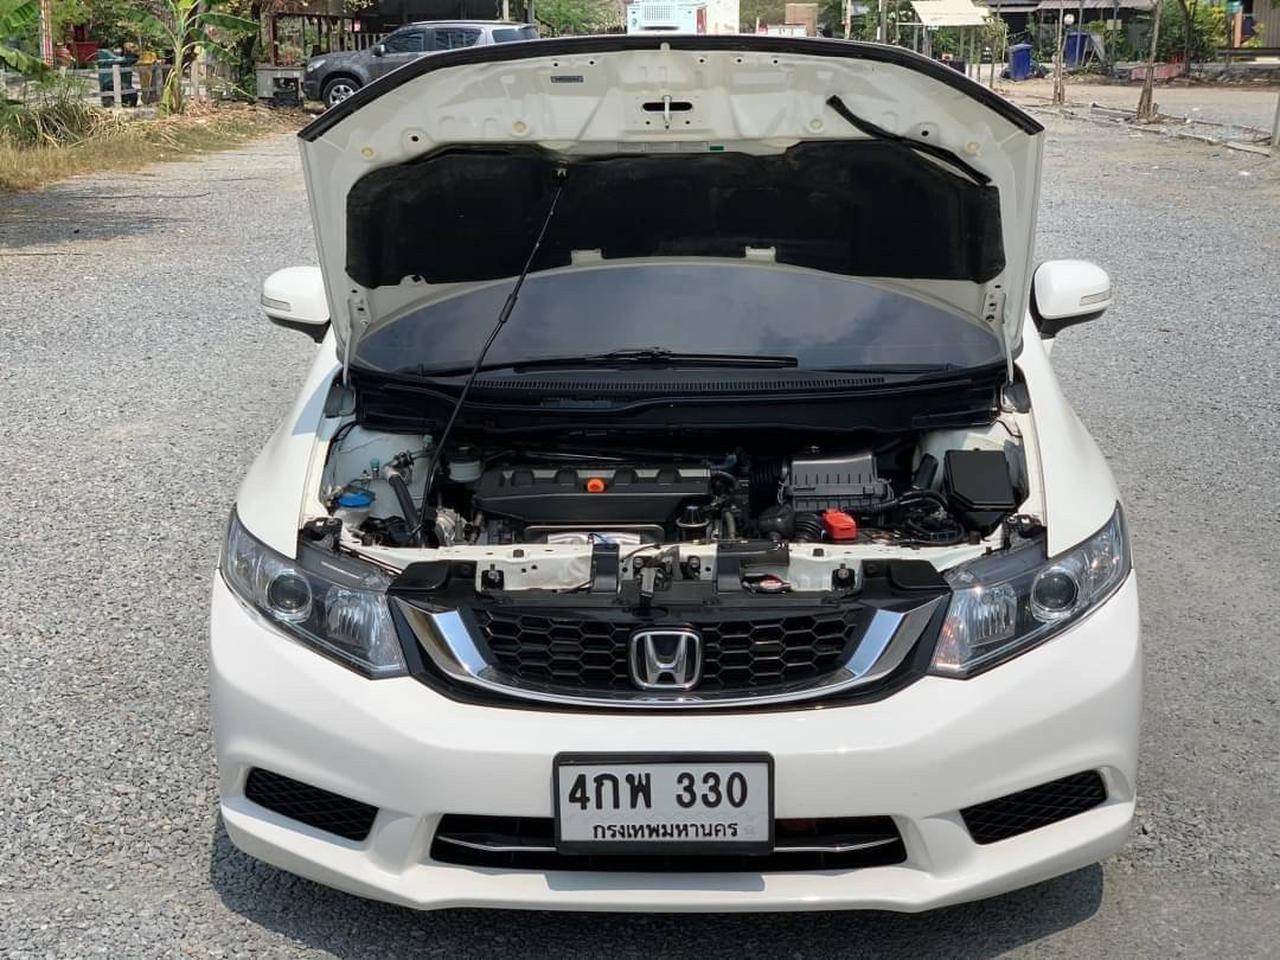 36 Honda Civic Fb 1.8s ปี 2015 สีขาว เกียร์ออโต้ รูปที่ 5